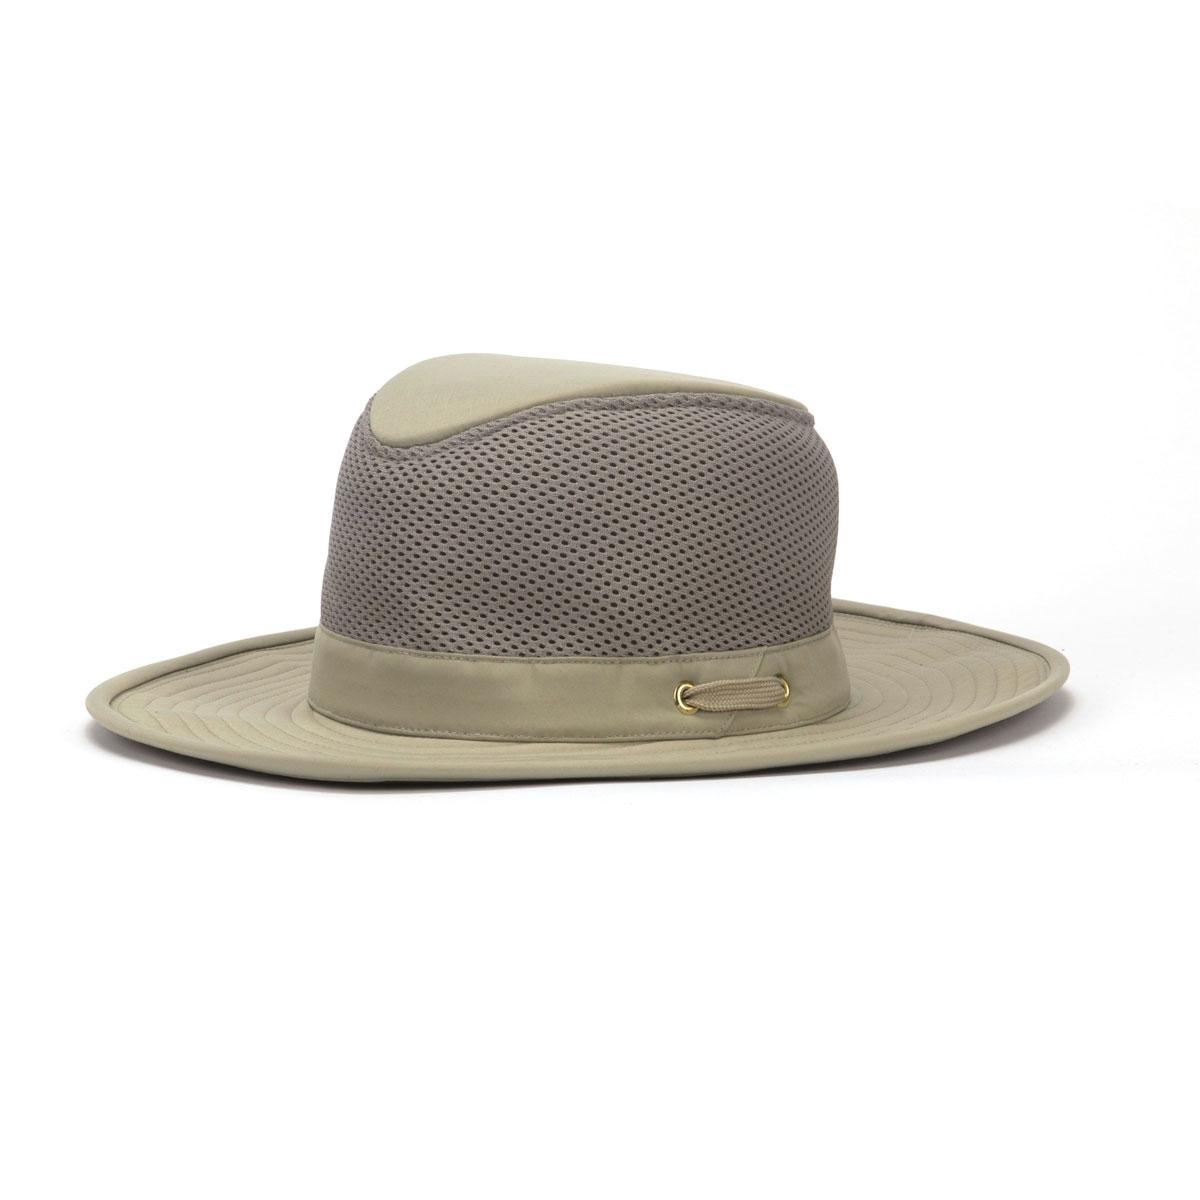 Image of Tilley Broad Curved Brim Lightweight 3 Inch Mesh Hat - Khaki Olive  Underbrim ... 756d5b53a5c